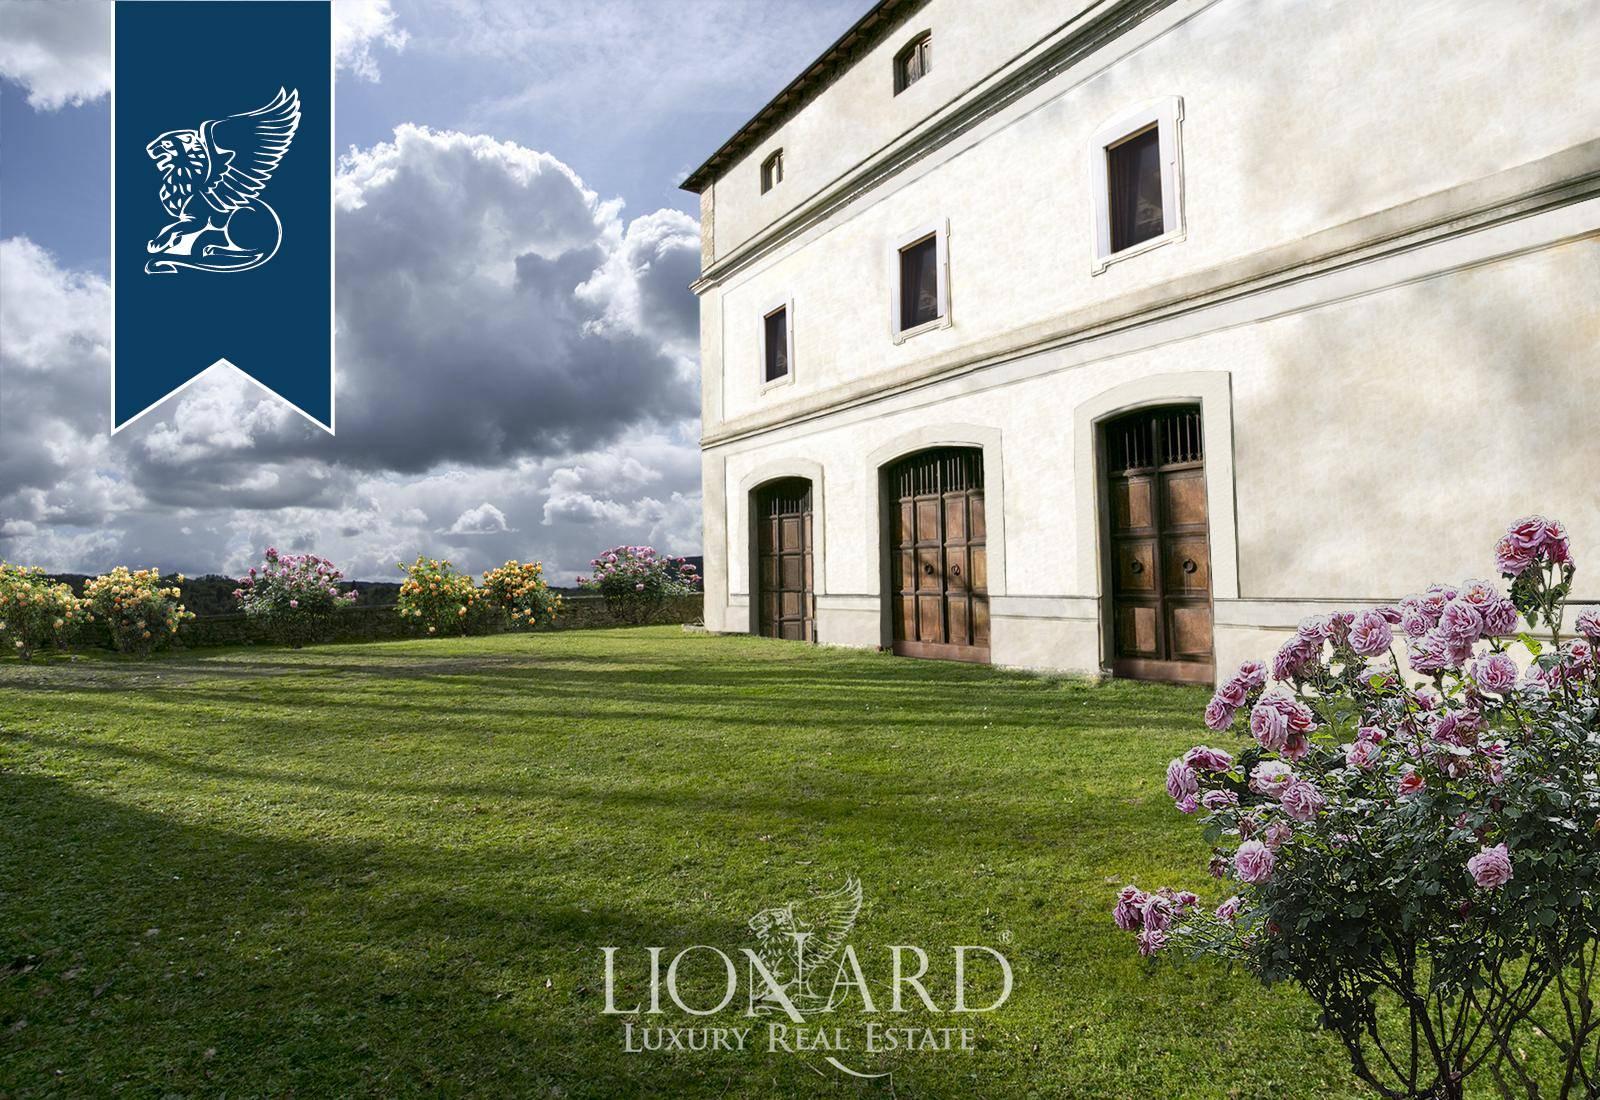 Azienda in Vendita a Montale: 0 locali, 4135 mq - Foto 6